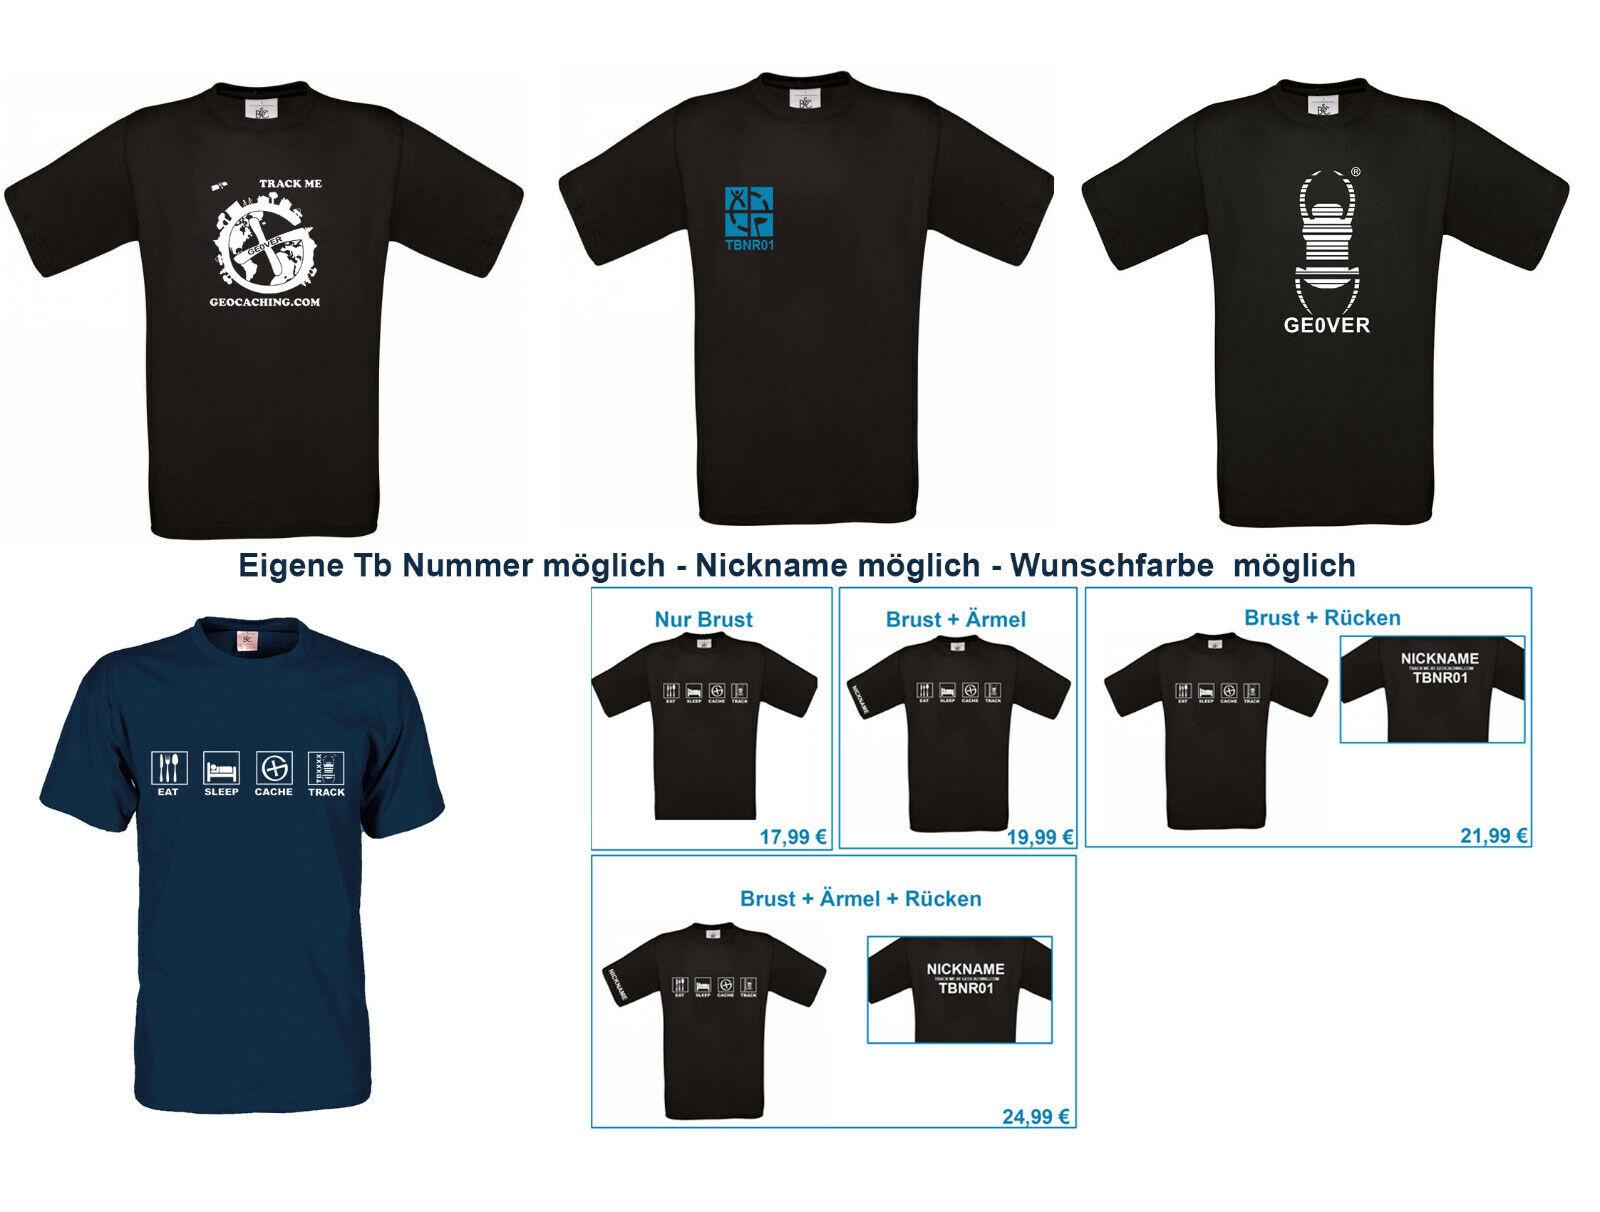 Geocaching T-Shirt eigene Tb Nr. Geocacher Bekleidung Personalisierbar Nickname